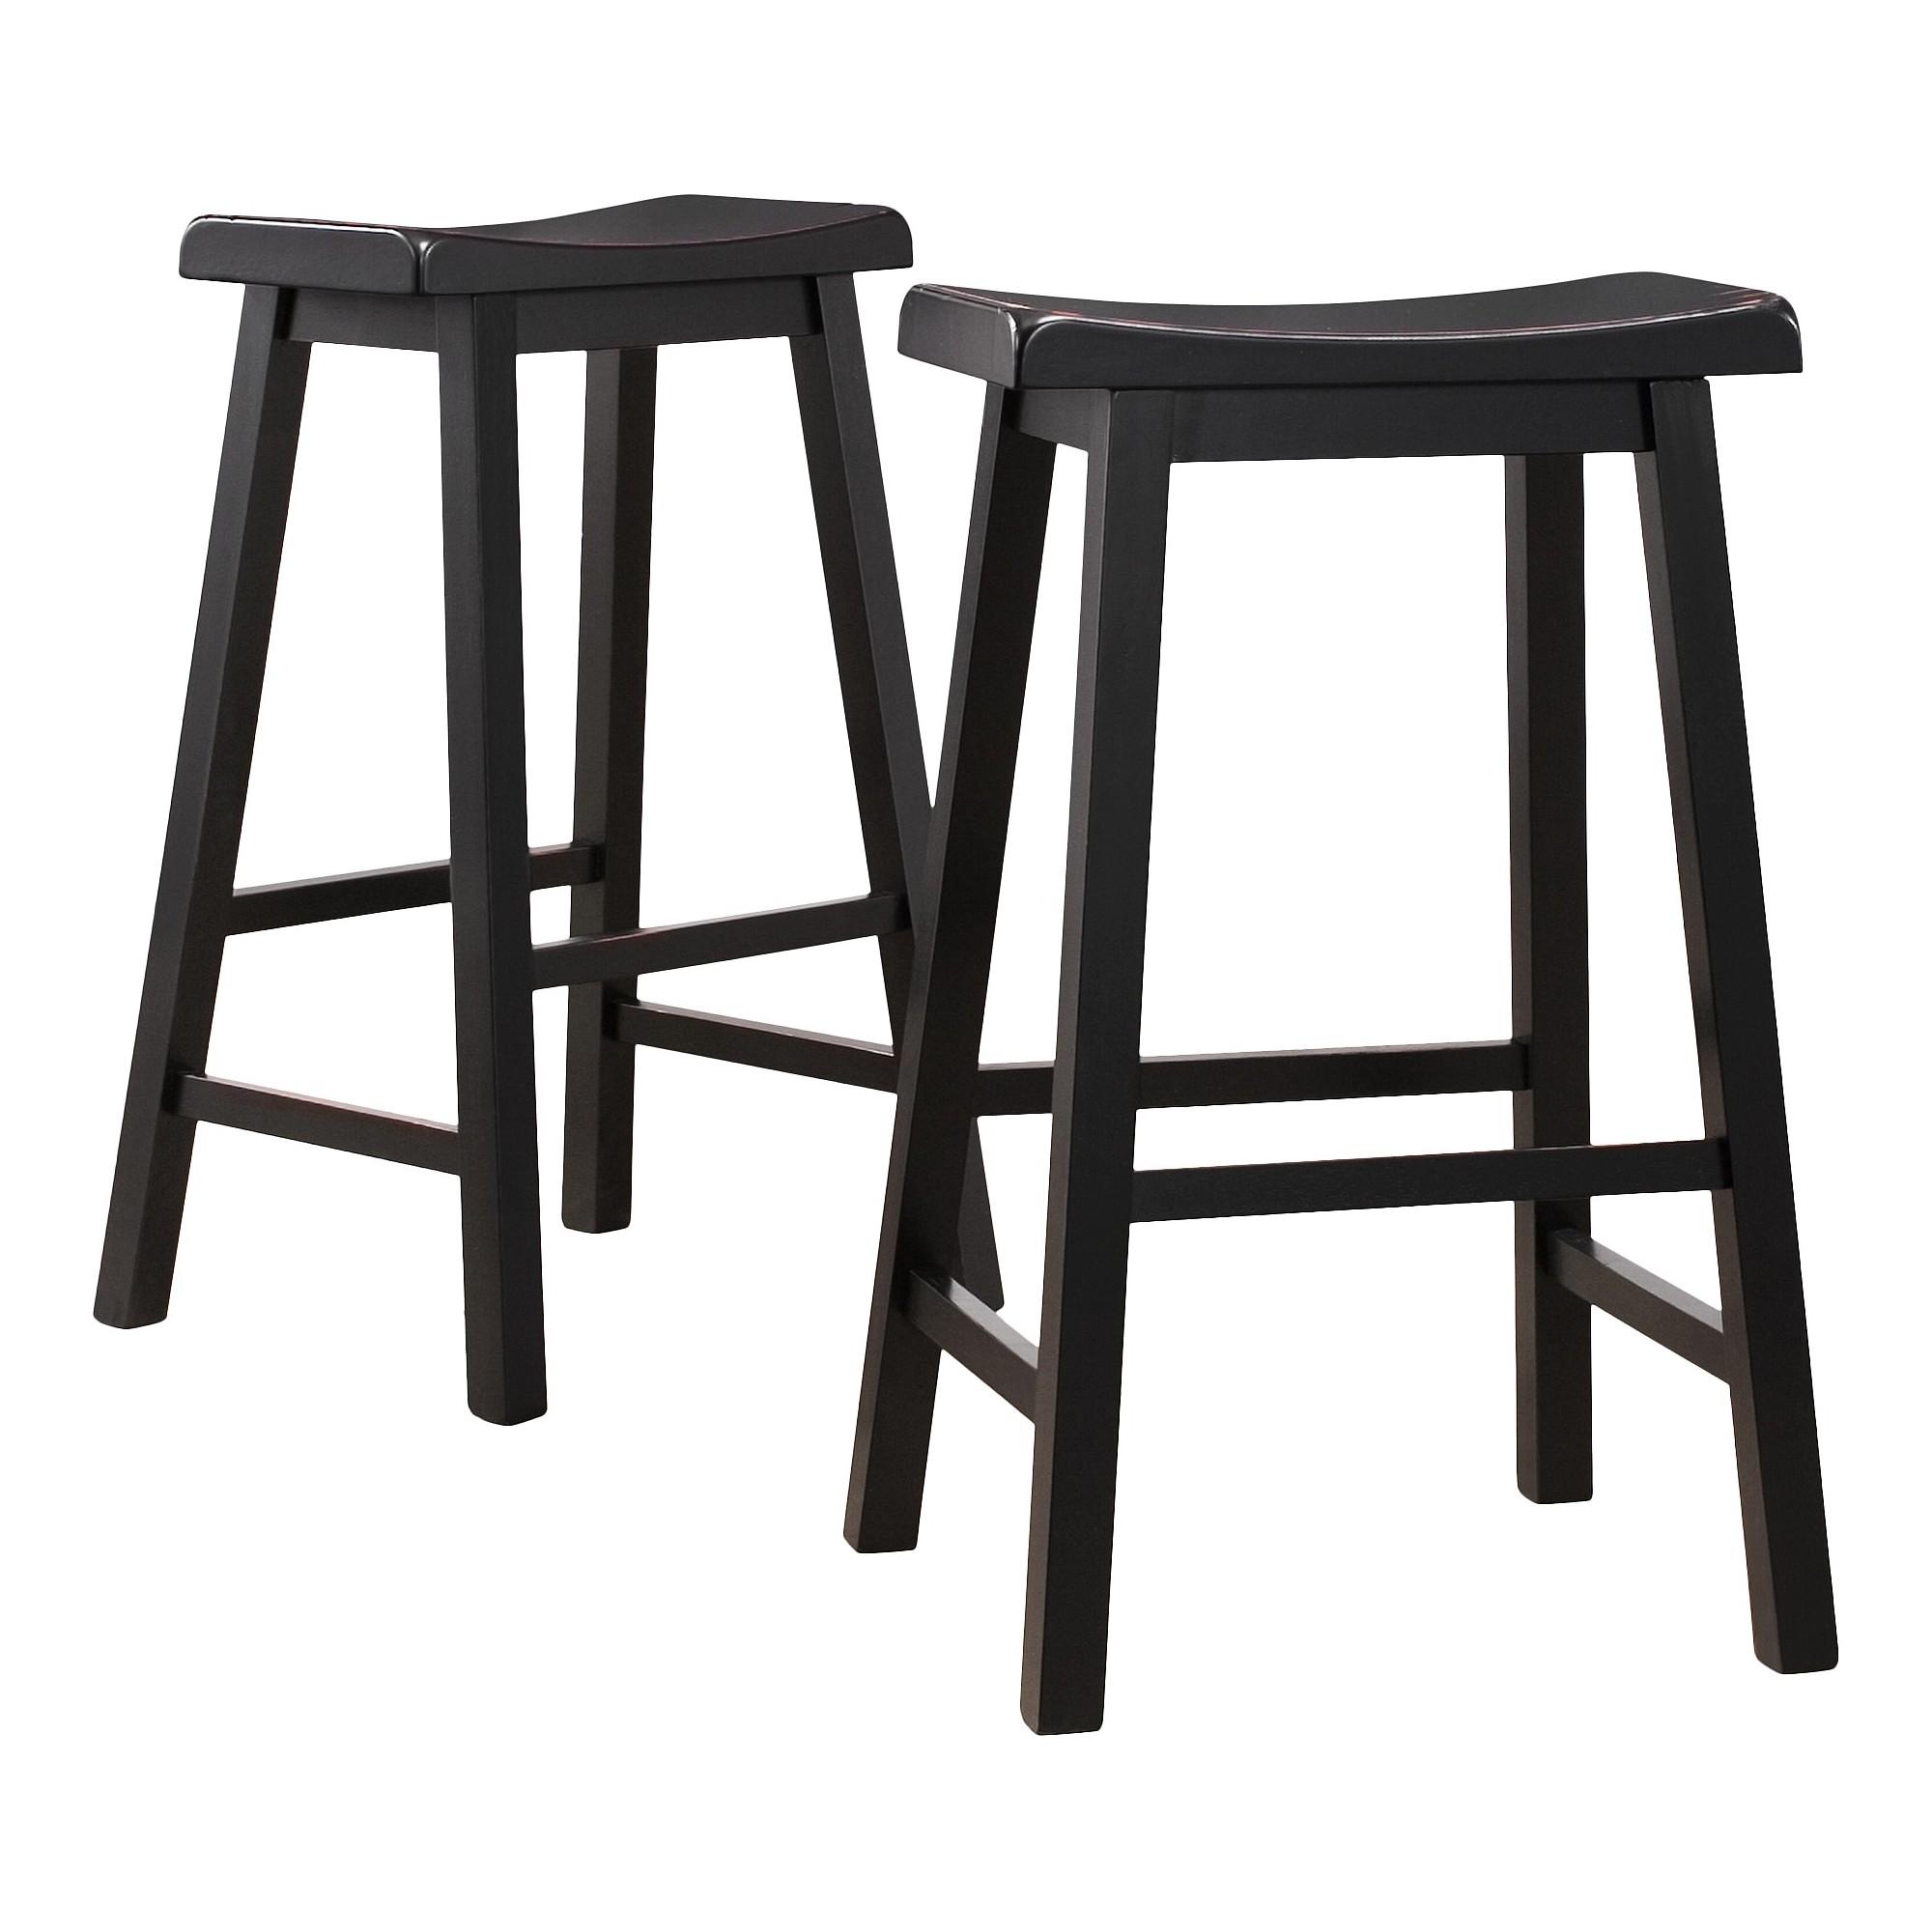 'Scoop 29'' Barstools - Black (Set of 2)'